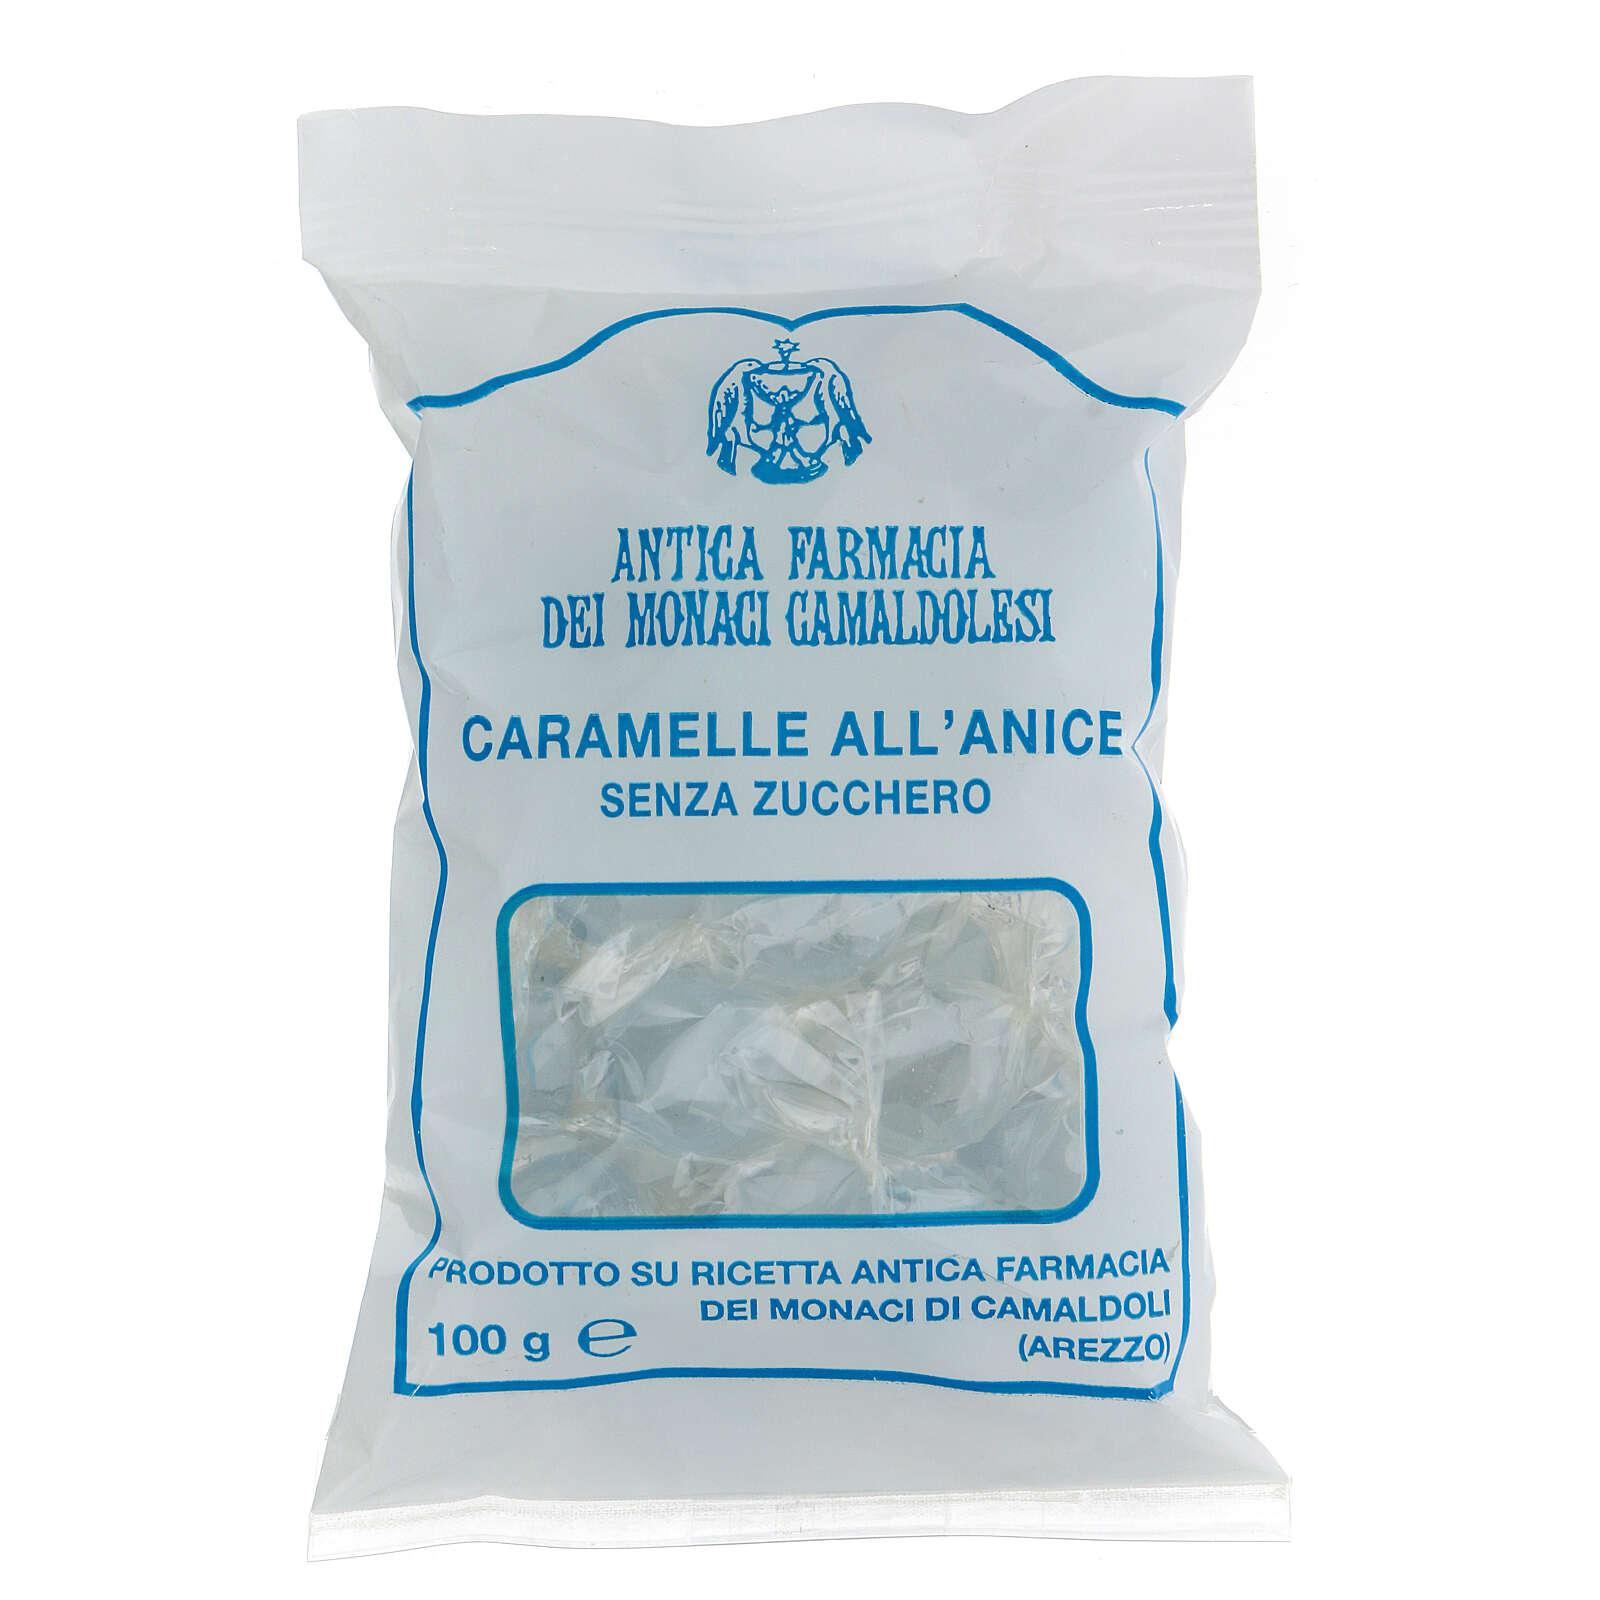 Caramelle all'Anice SENZA ZUCCHERO 100 gr Camaldoli 3